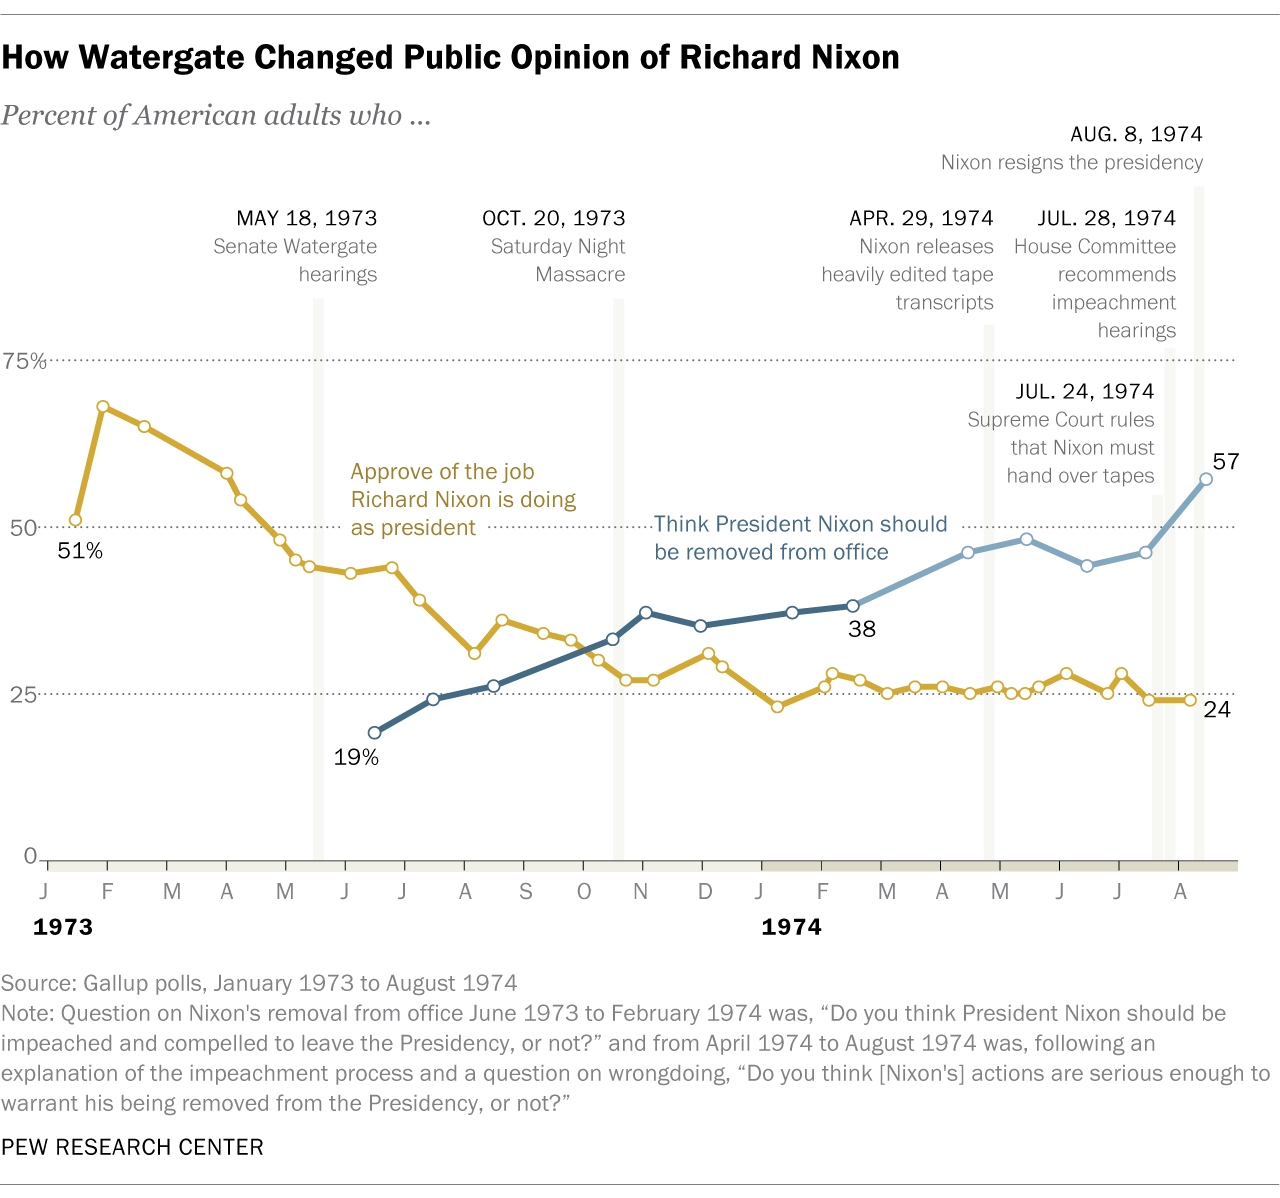 How Watergate Changed Public Opinion of Richard Nixon